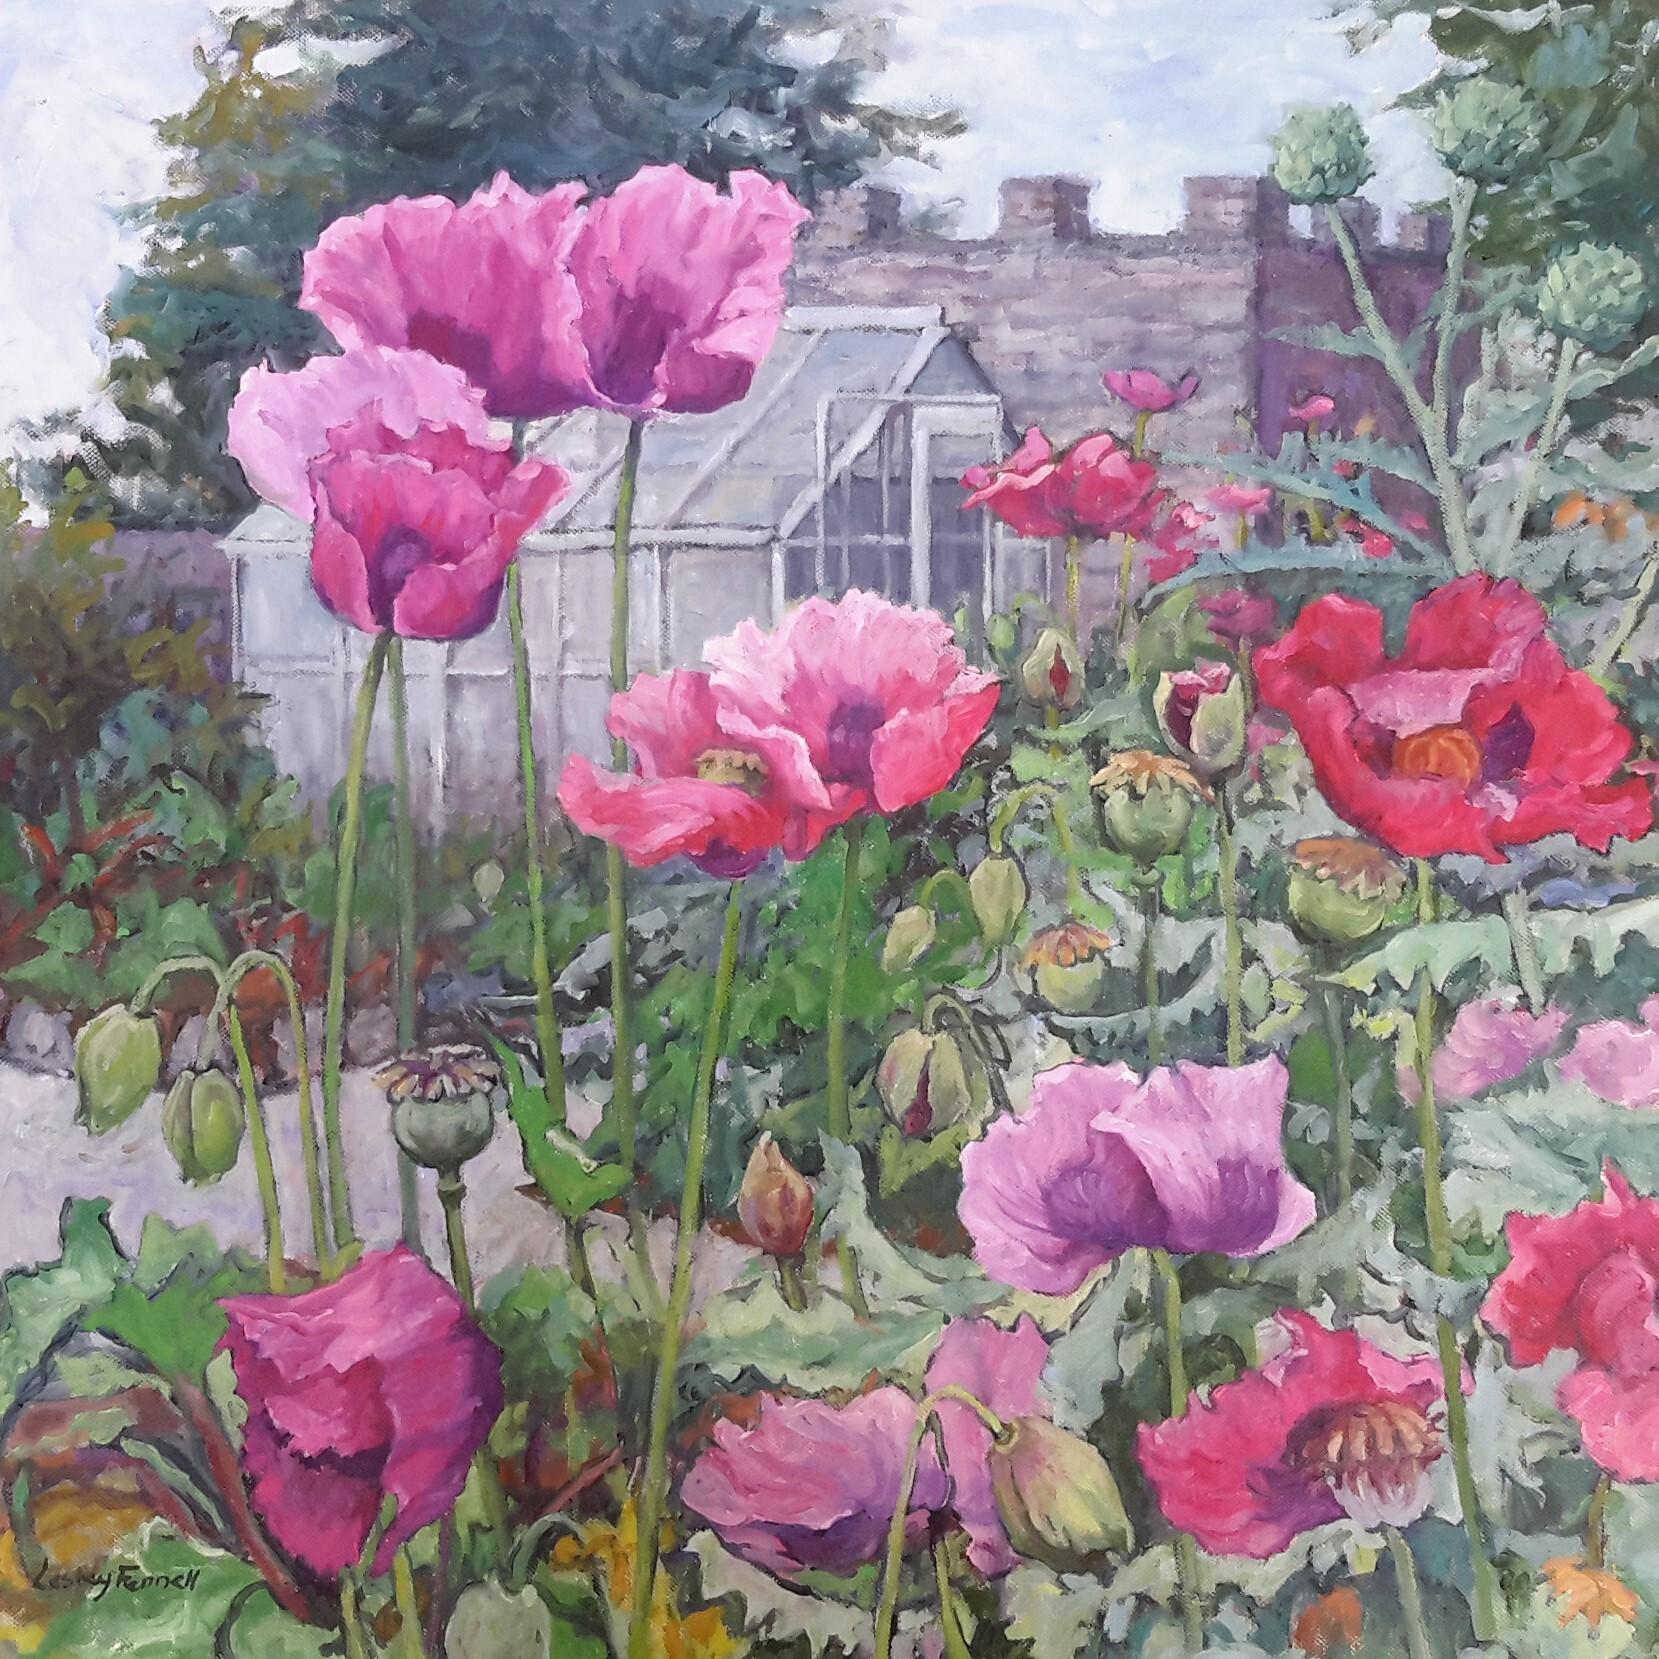 Burtown, Co. Kilkenny (Lesley Fennell)